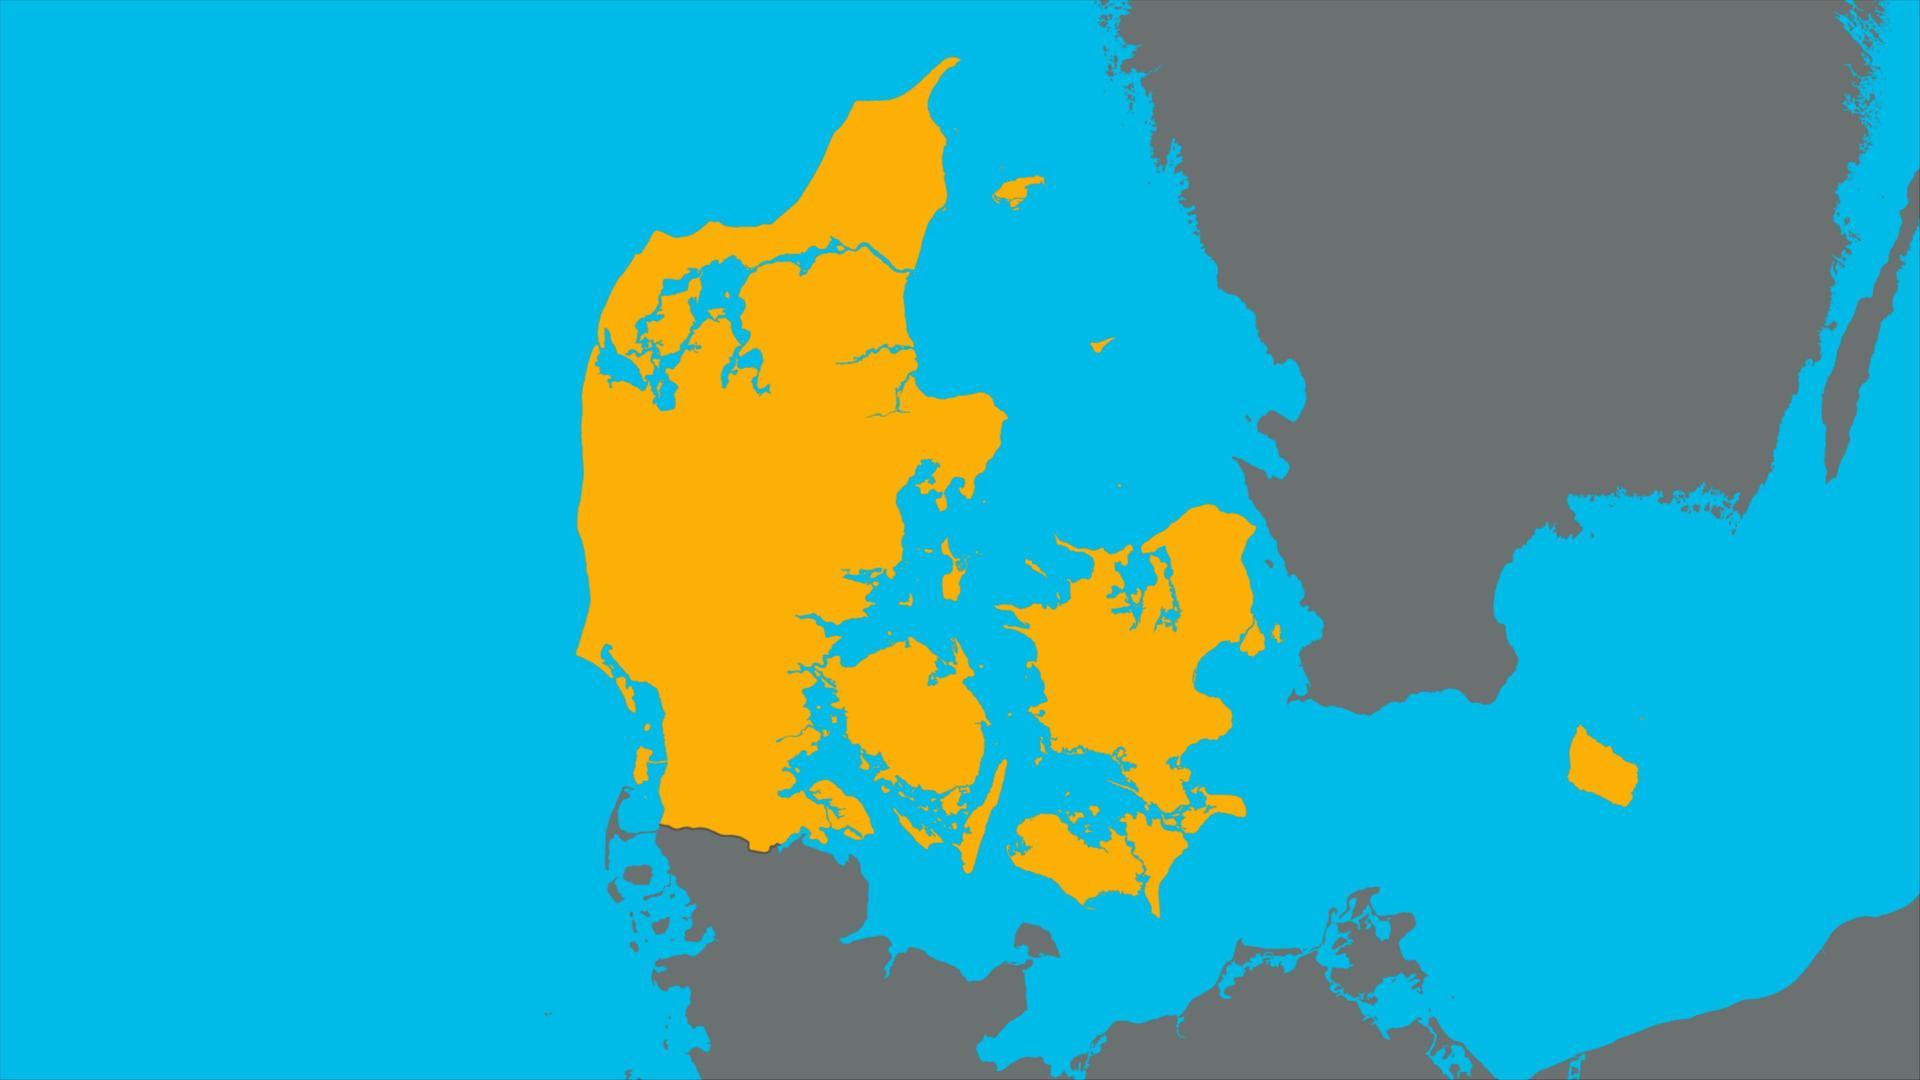 deutschland dänemark landkarte logo!: Dänemark   ZDFtivi